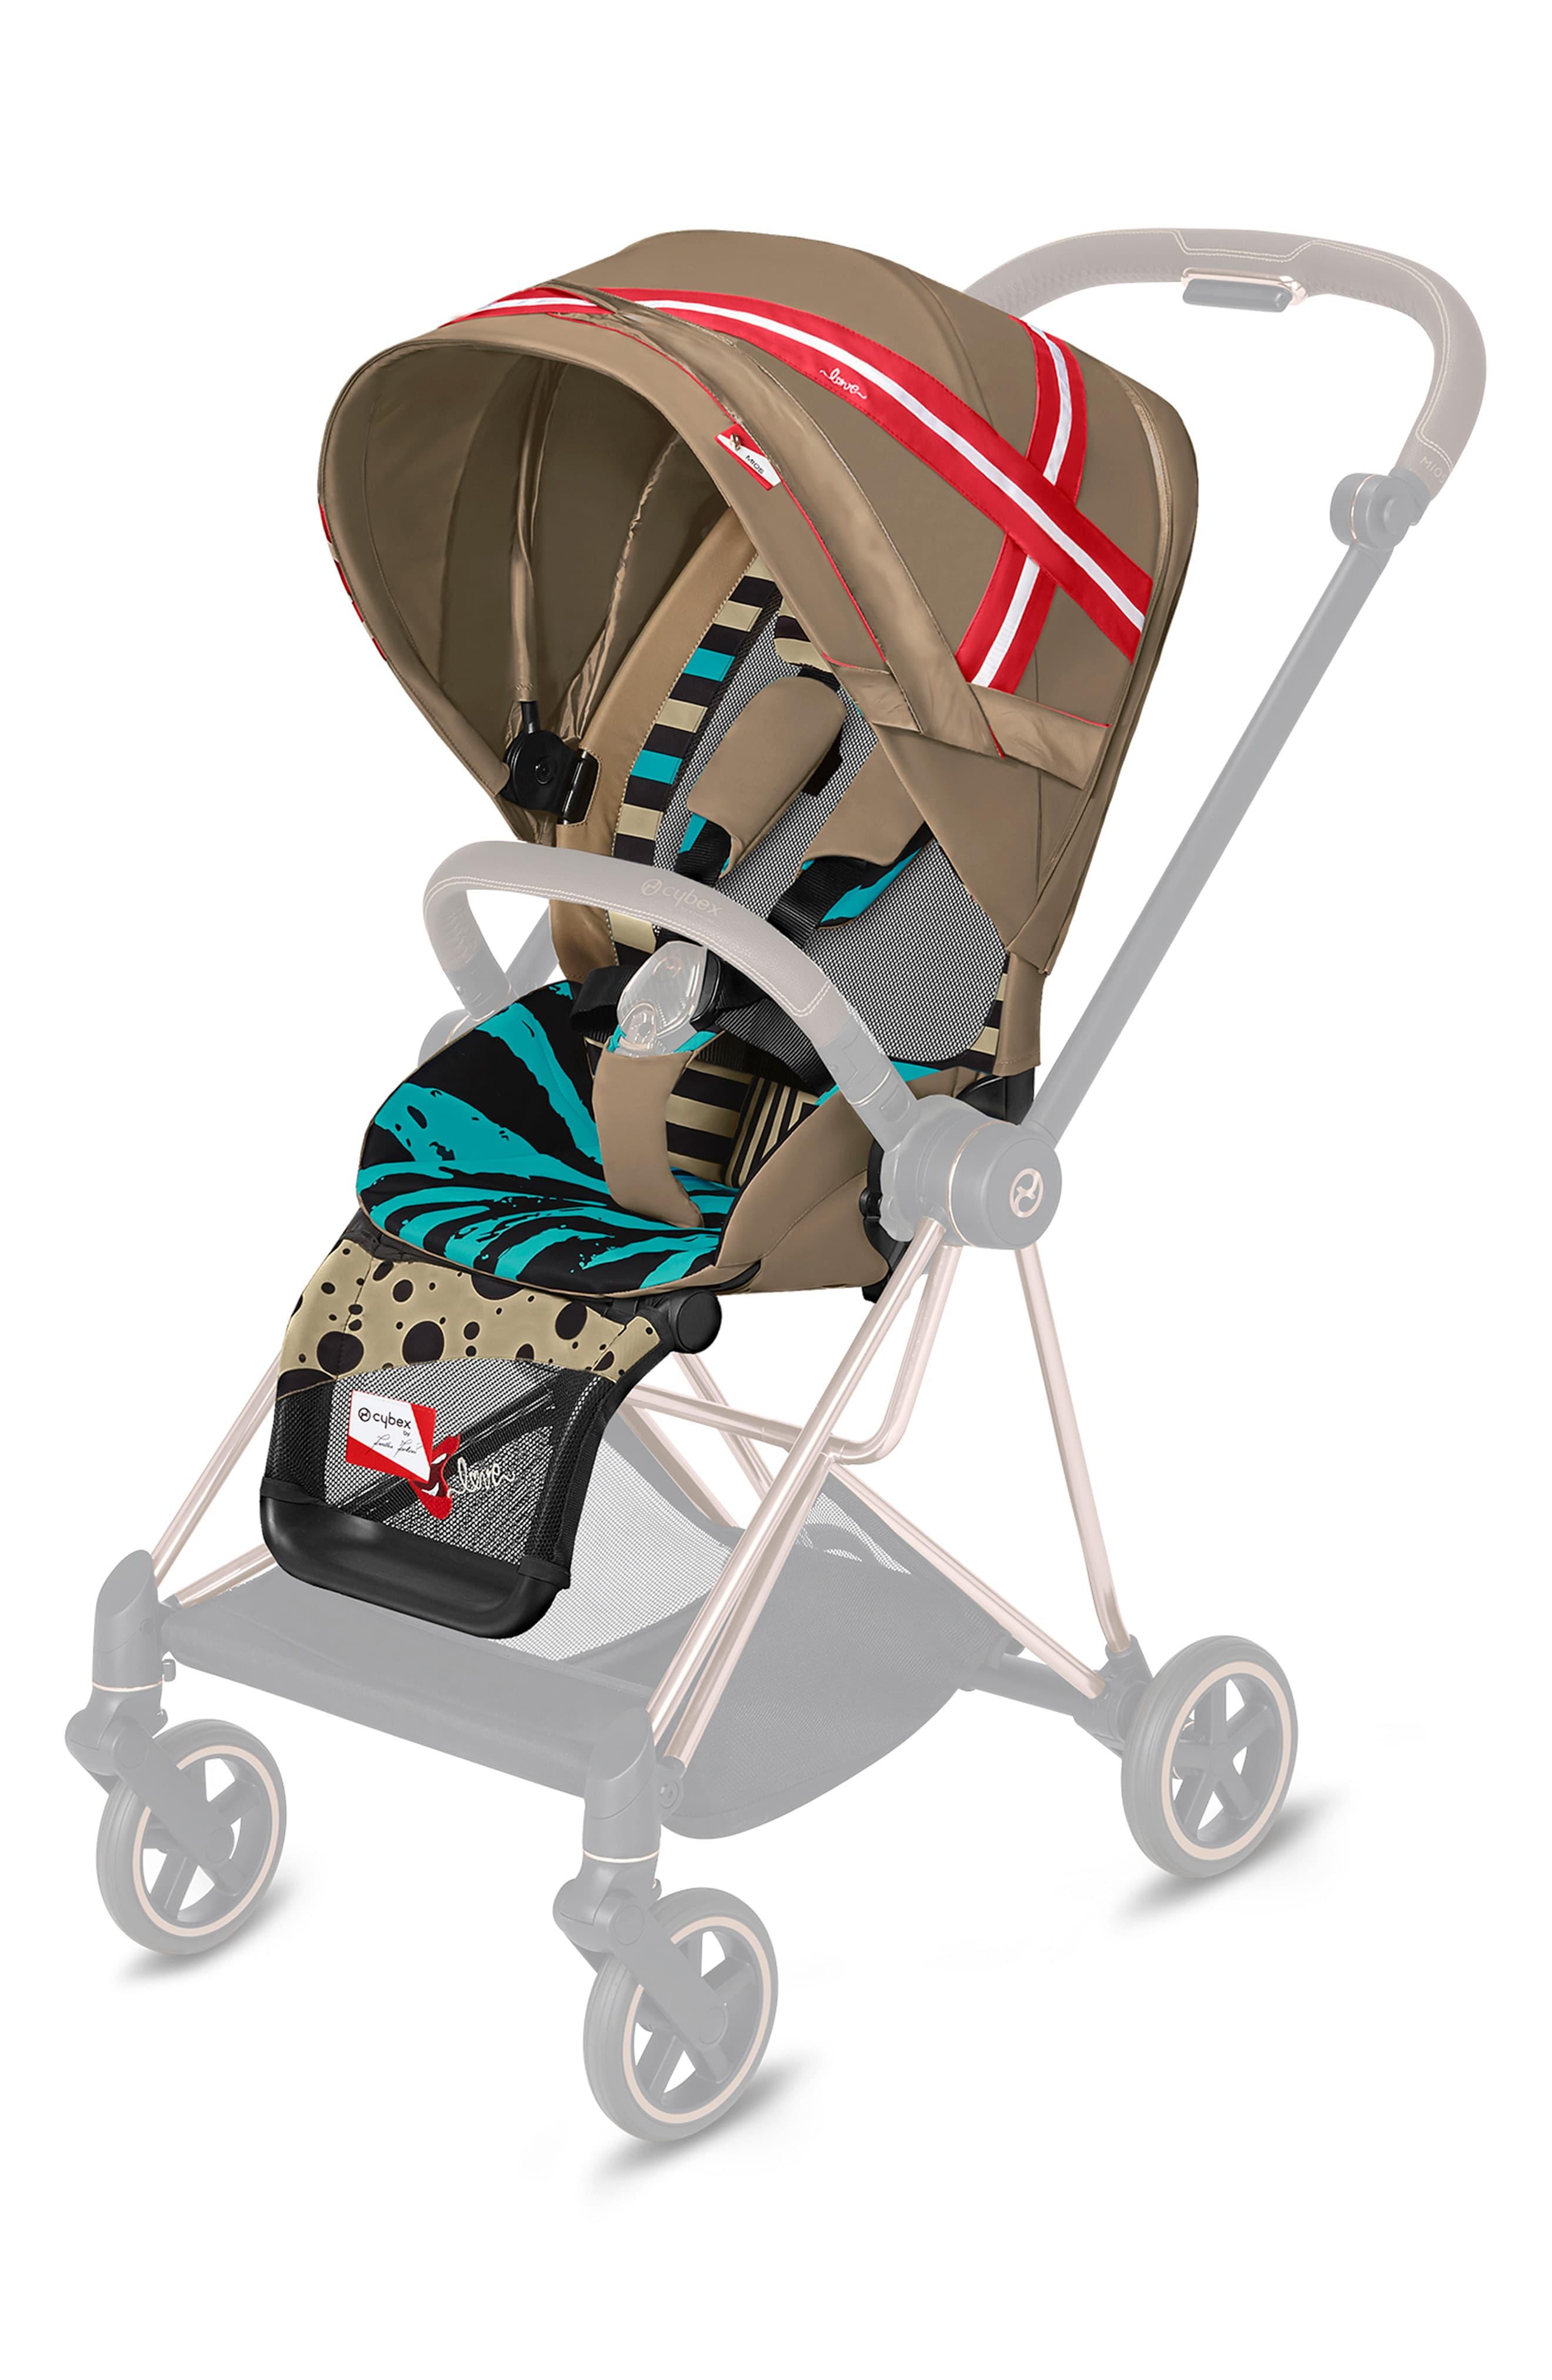 Infant Cybex X Karolina Kurkova Seat Design Pack For Mios